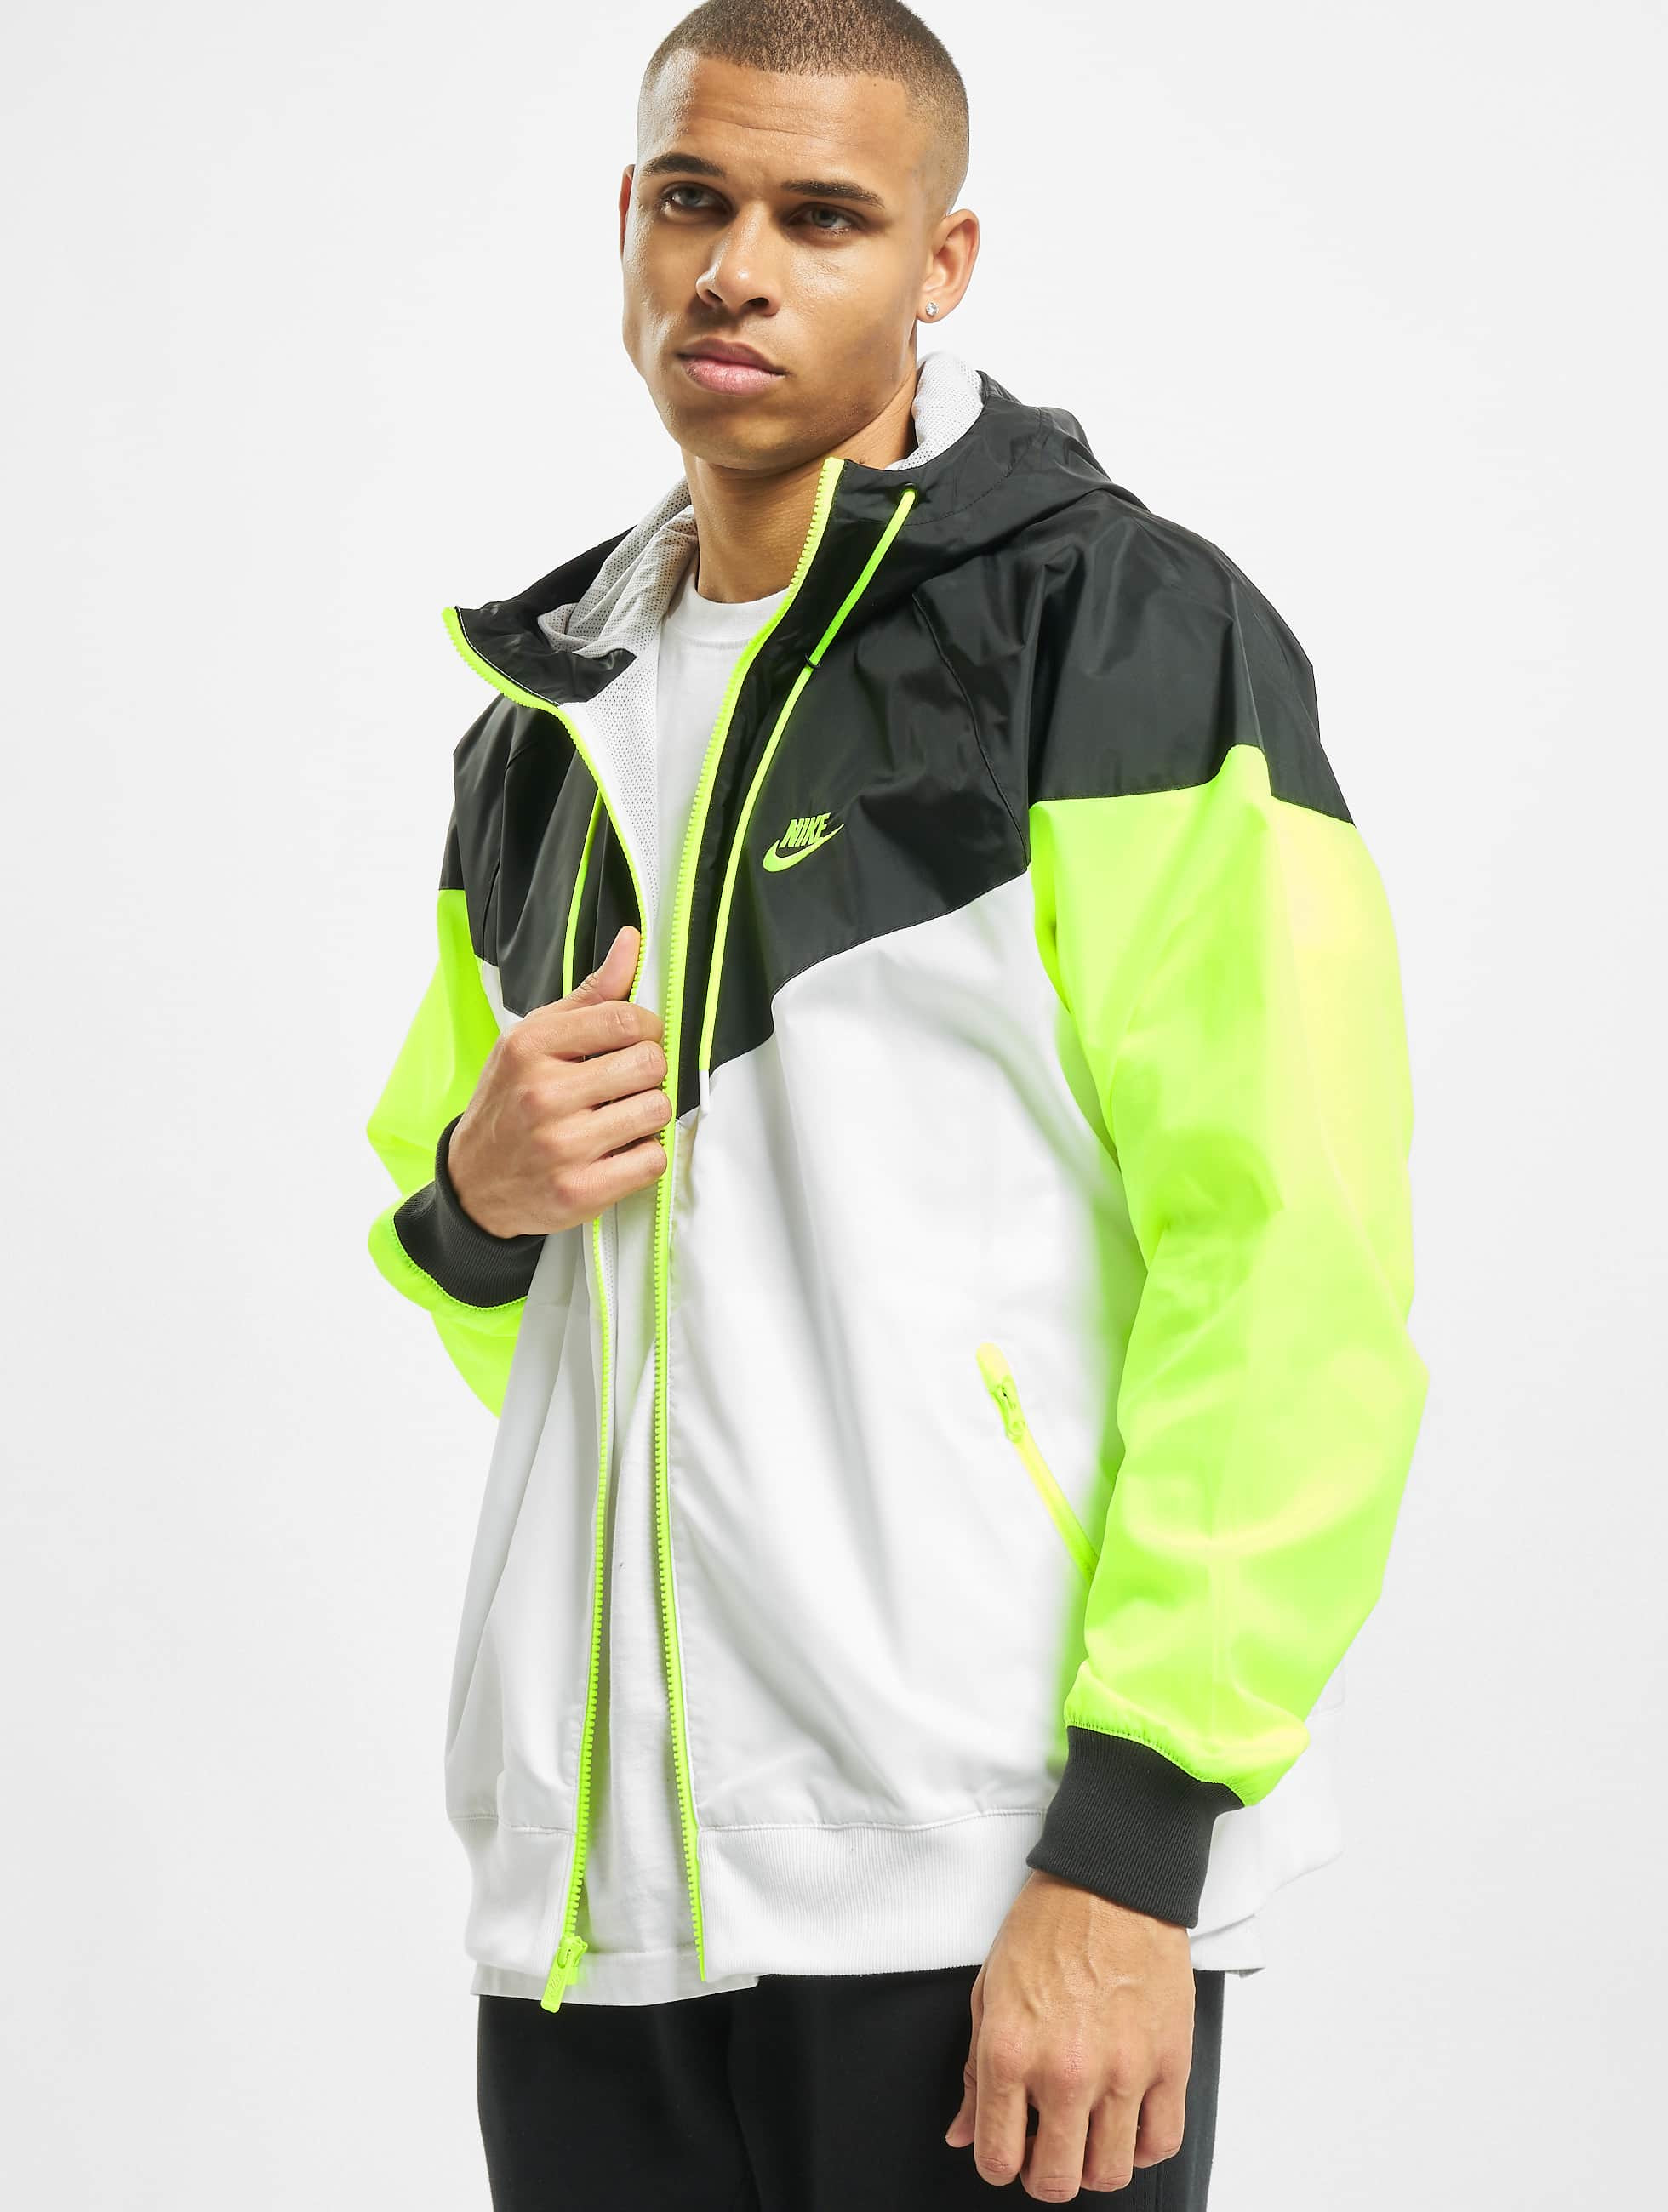 Nike Sportswear Windrunner Blouson whitewolf greydark